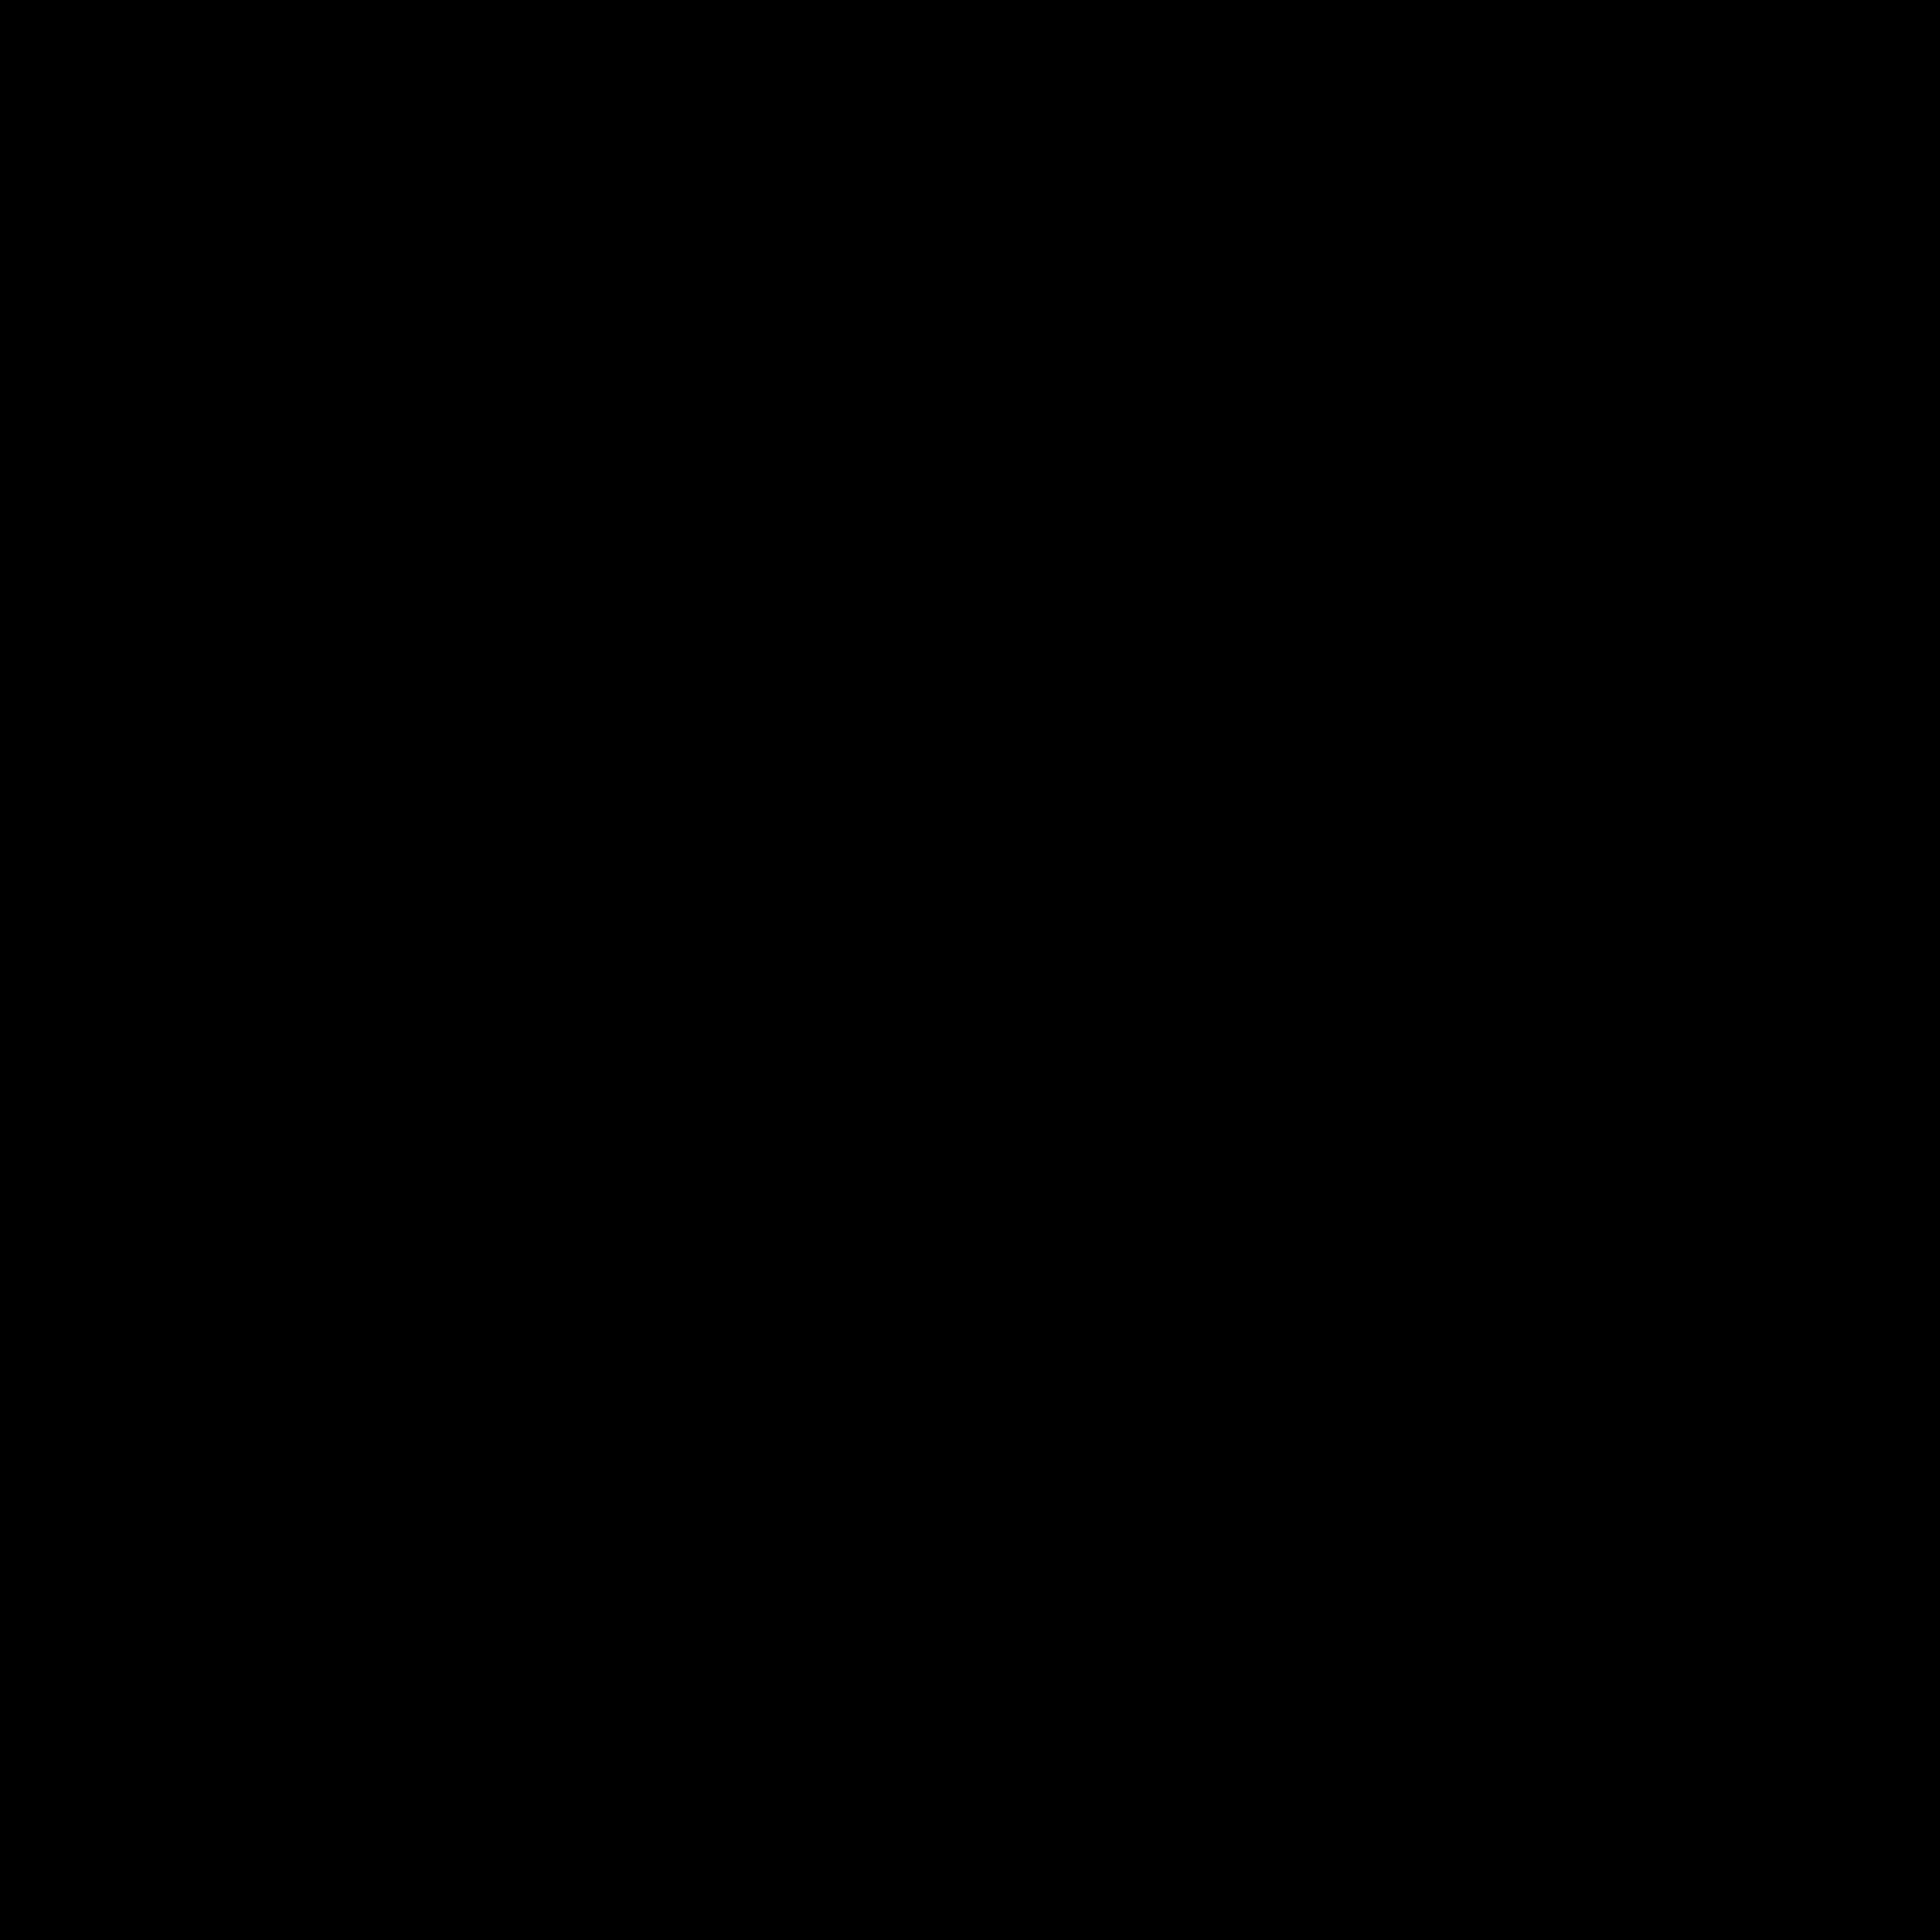 clipart transparent download Clipart